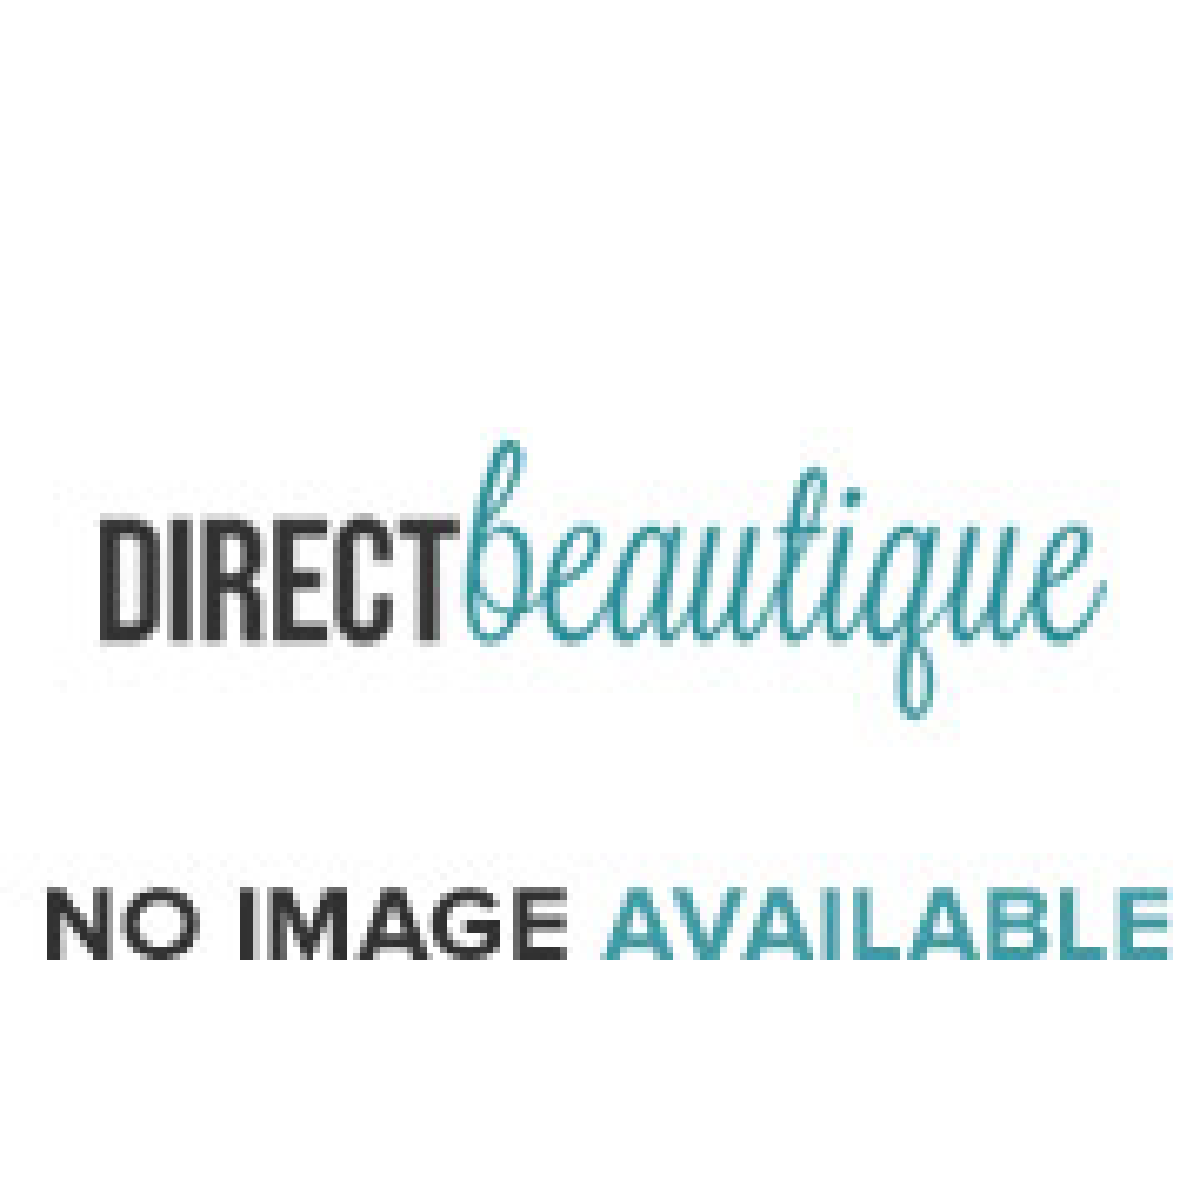 Christian Dior Eau Sauvage 200ml EDT Spray